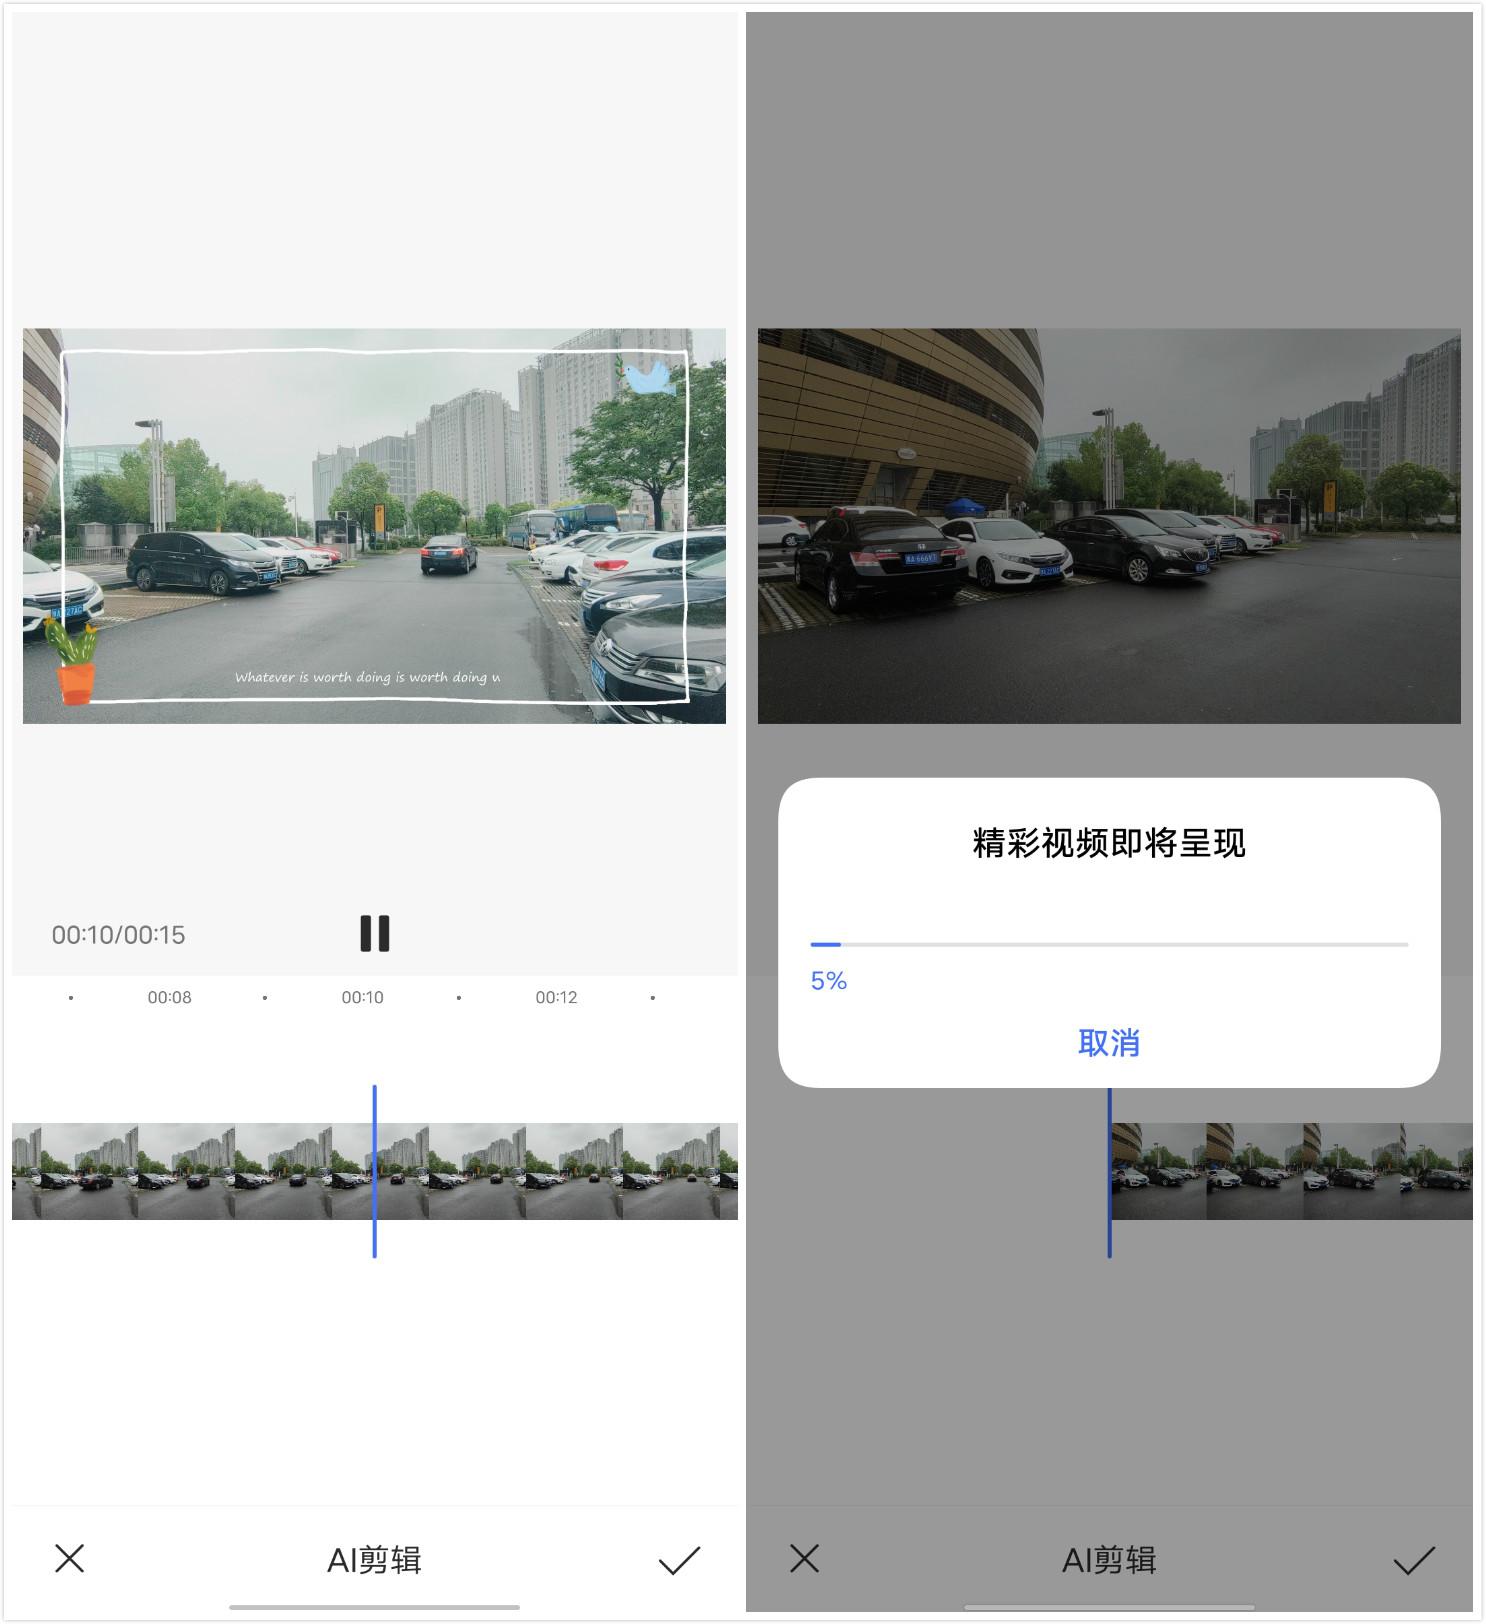 vivo X50 Pro+评测:全能拍照 旗舰标杆